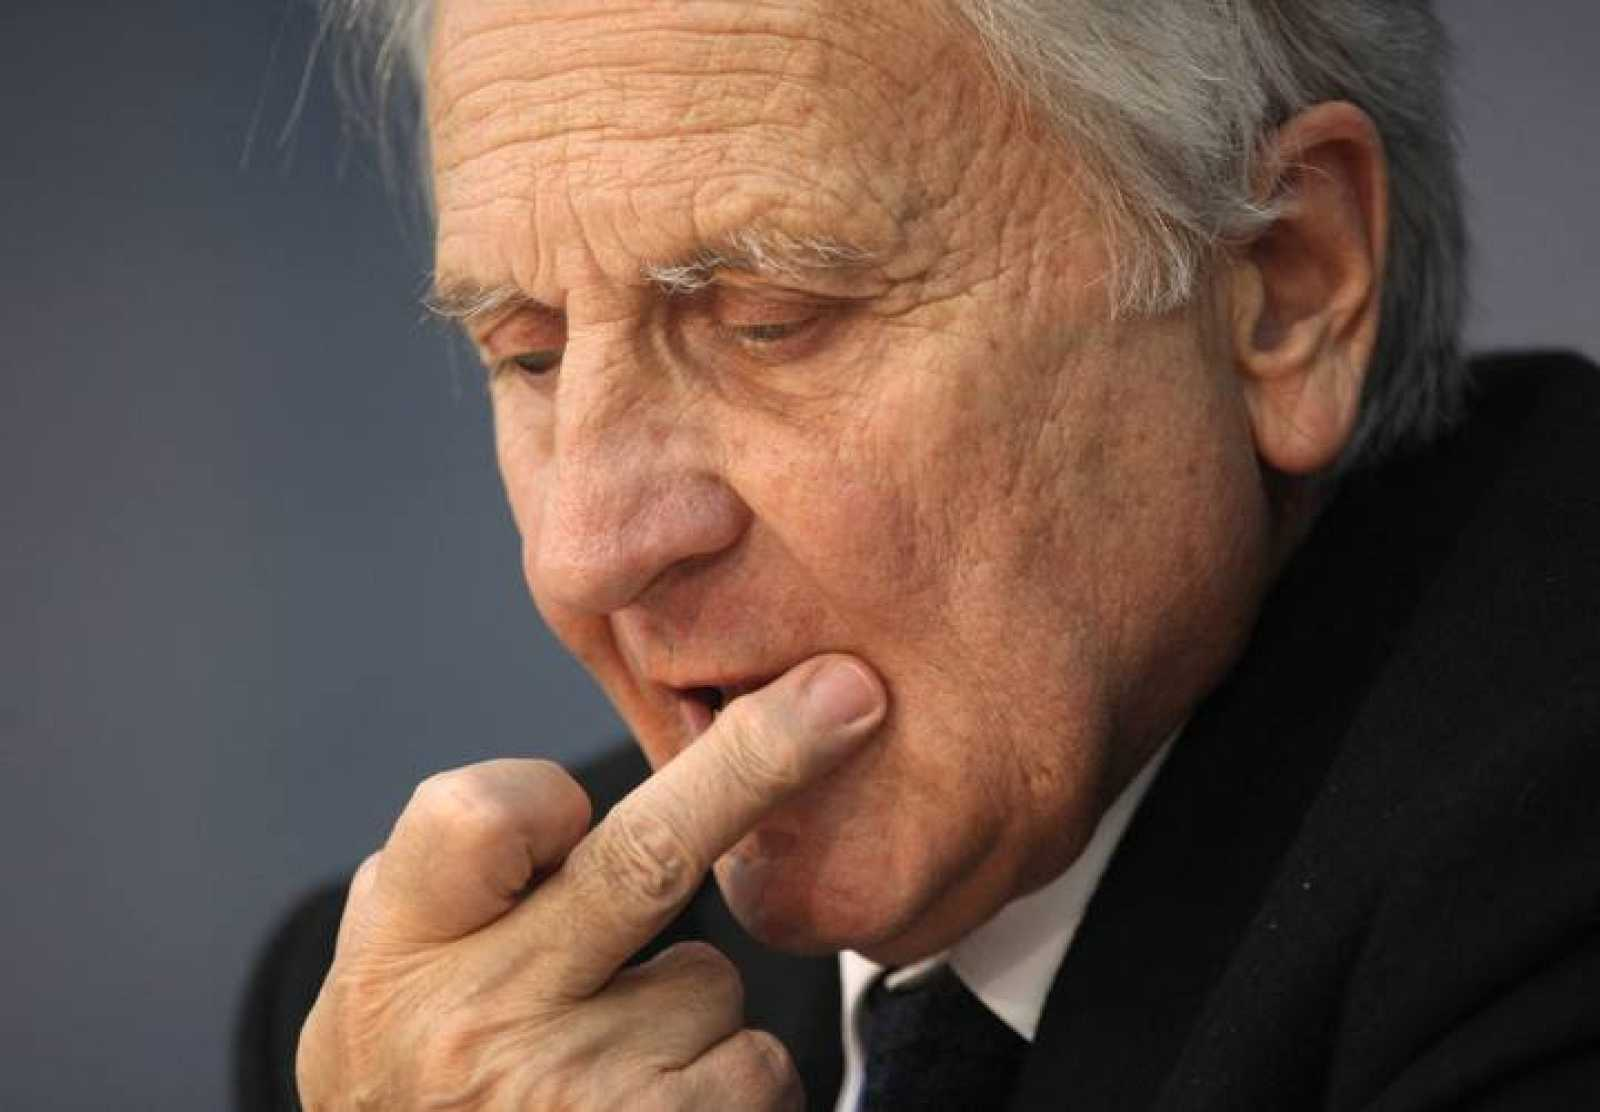 Jean-Claude Trichet, presidente del Banco Central Europeo